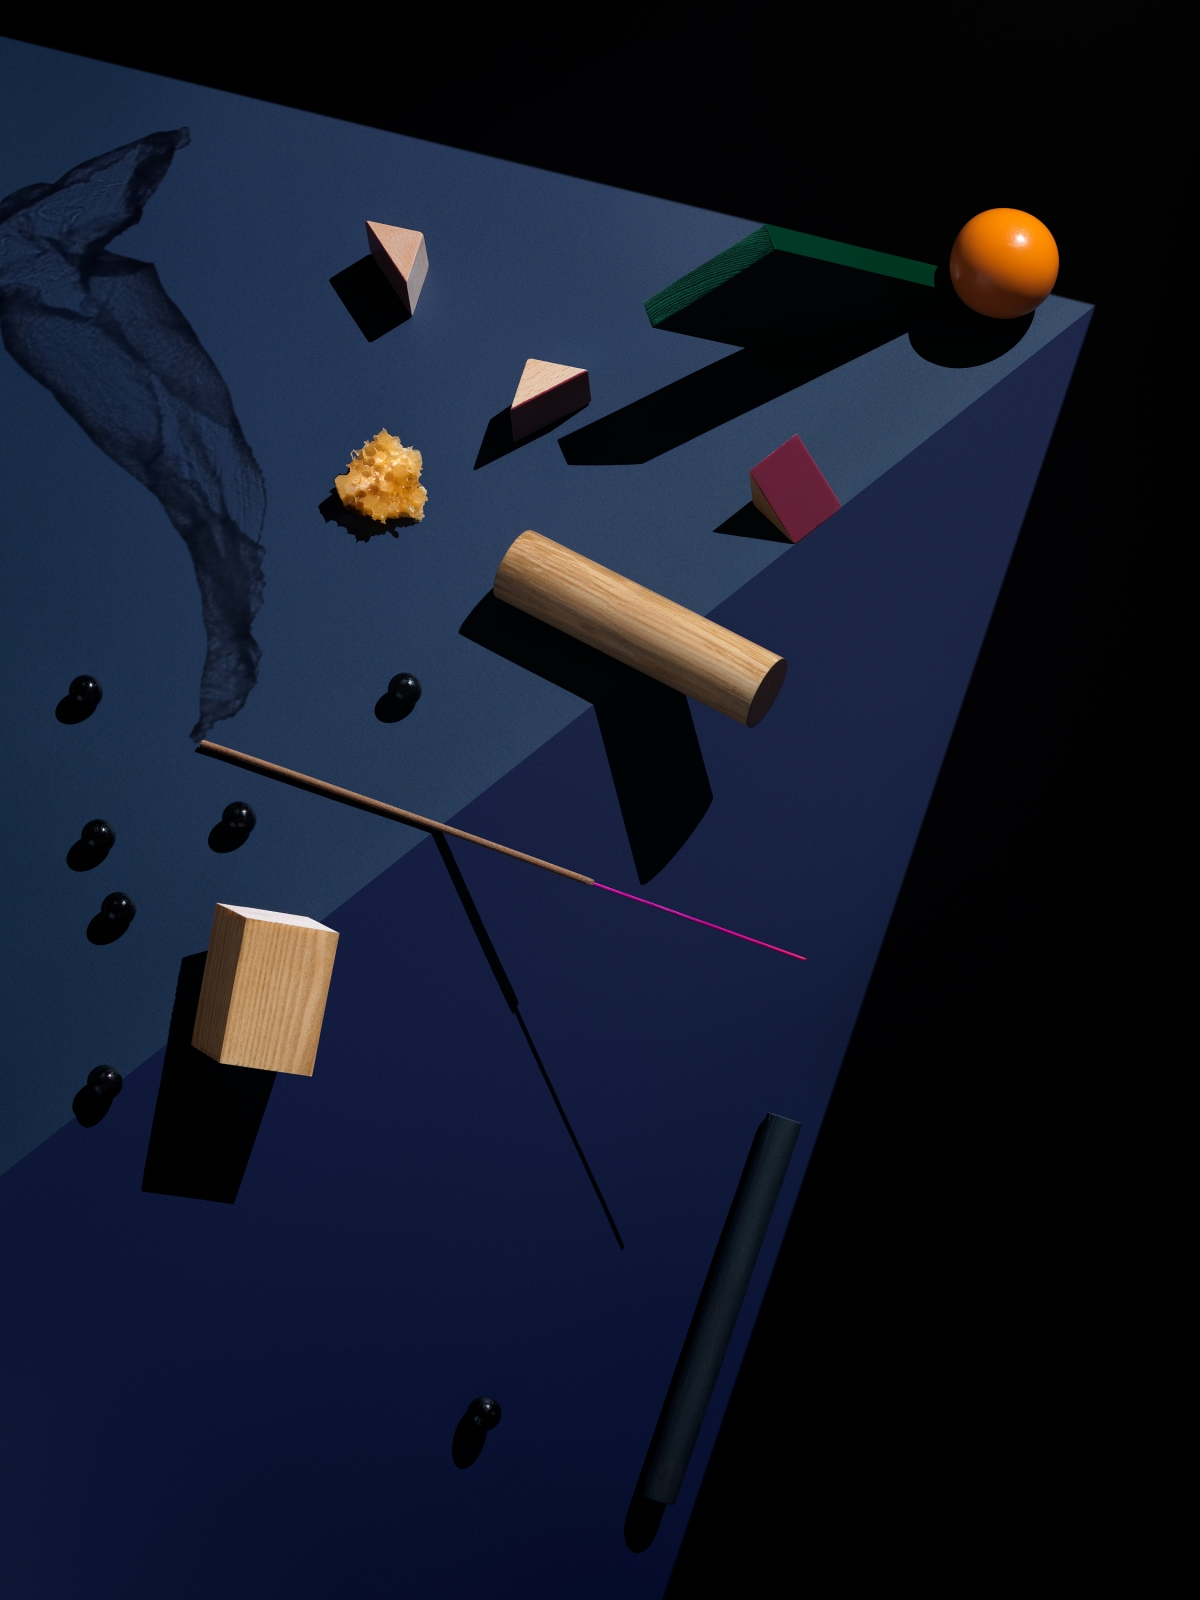 Fragrance Pyramids – Carl Kleiner